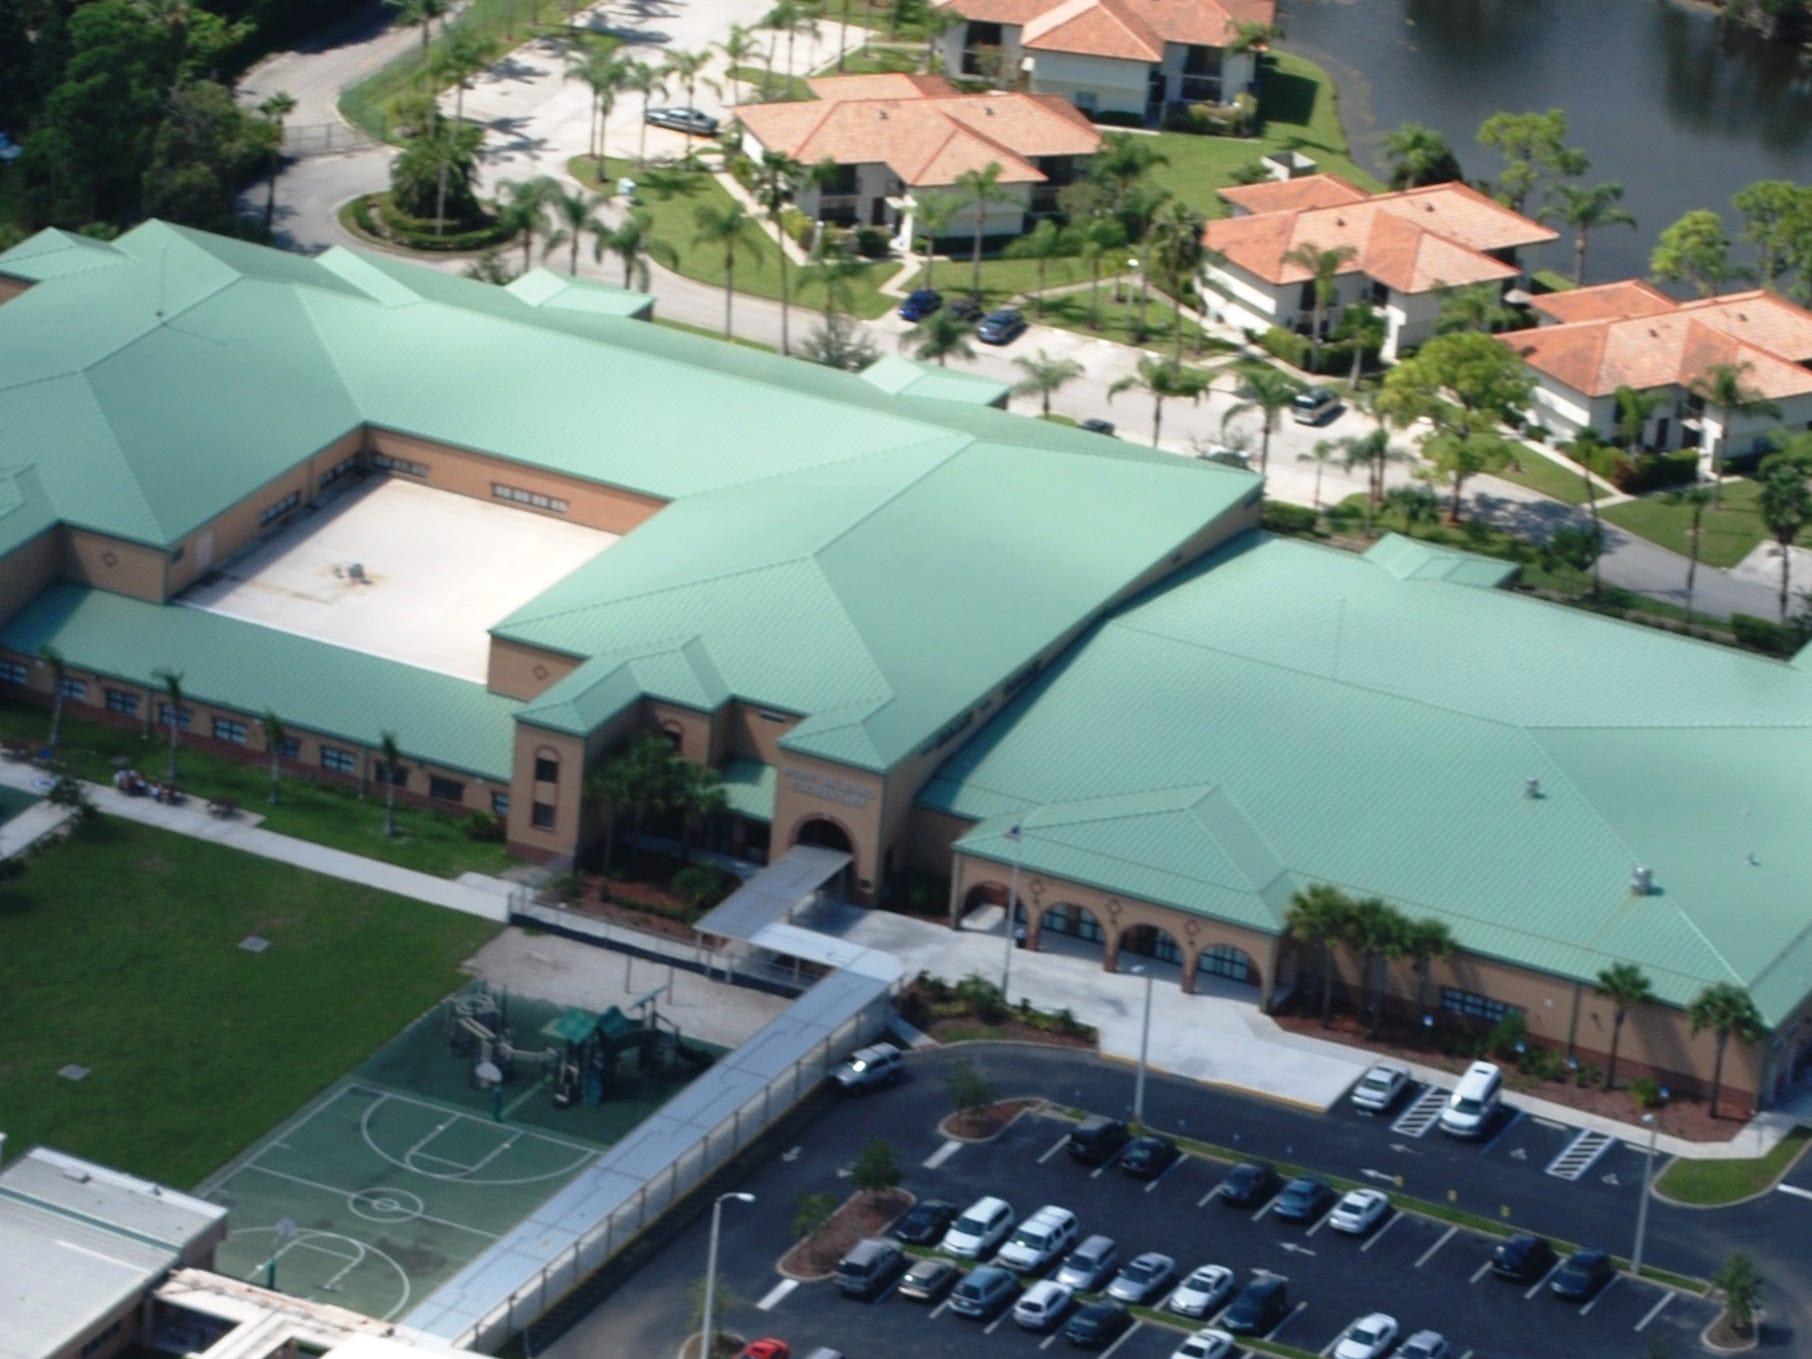 Port Salerno Elementary School